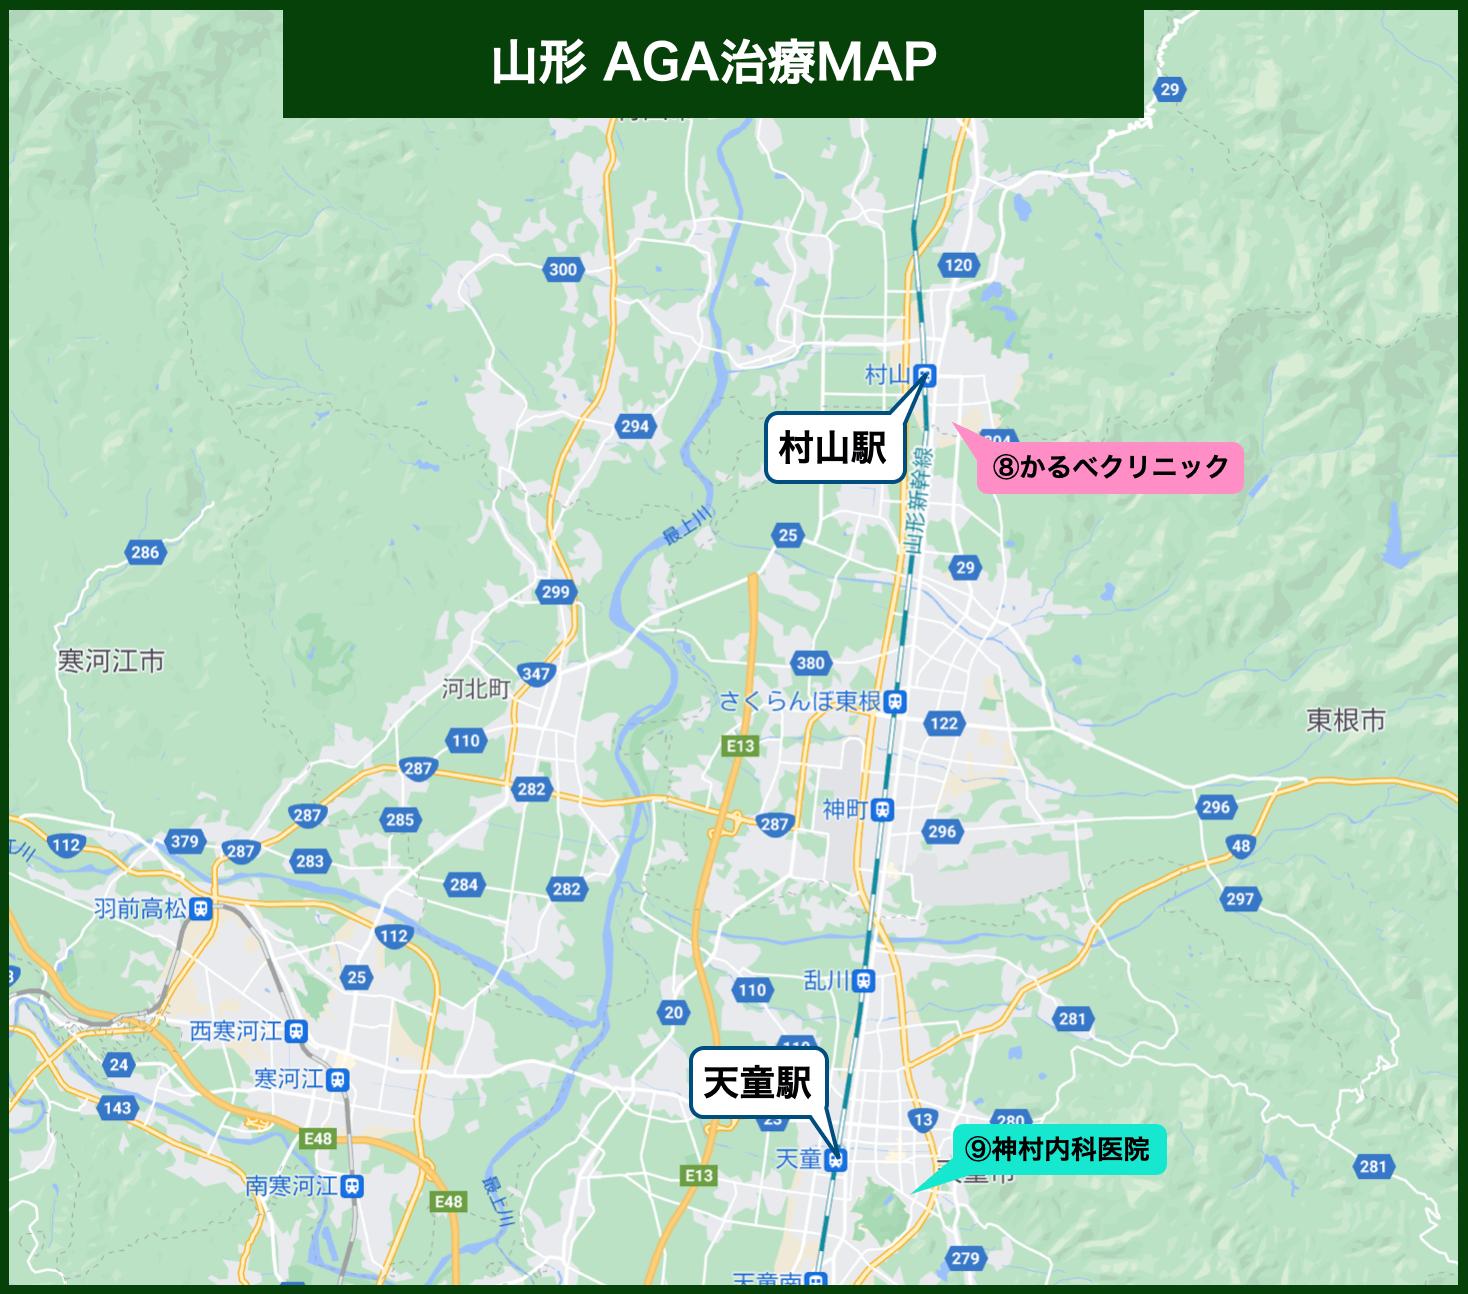 山形 AGA治療MAP